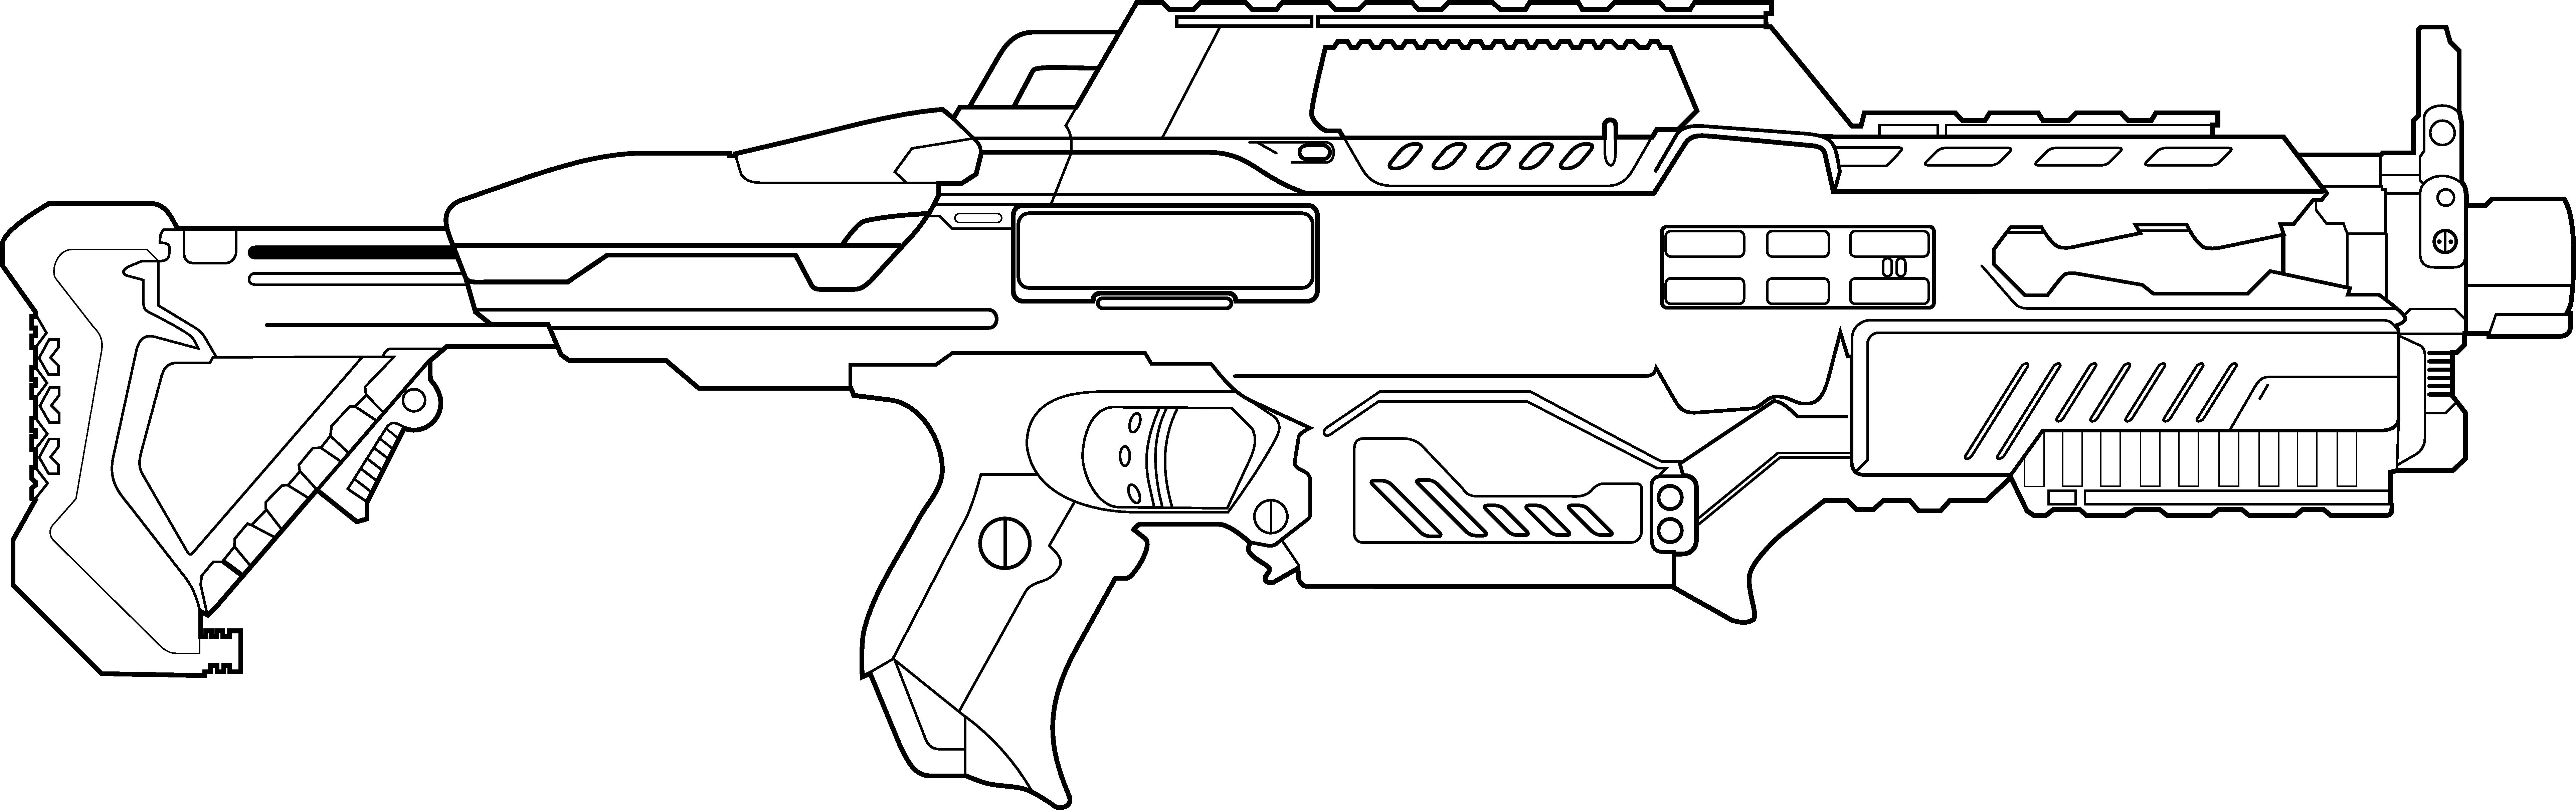 nerf pistool kleurplaat ausmalbild fn scar sturmgewehr